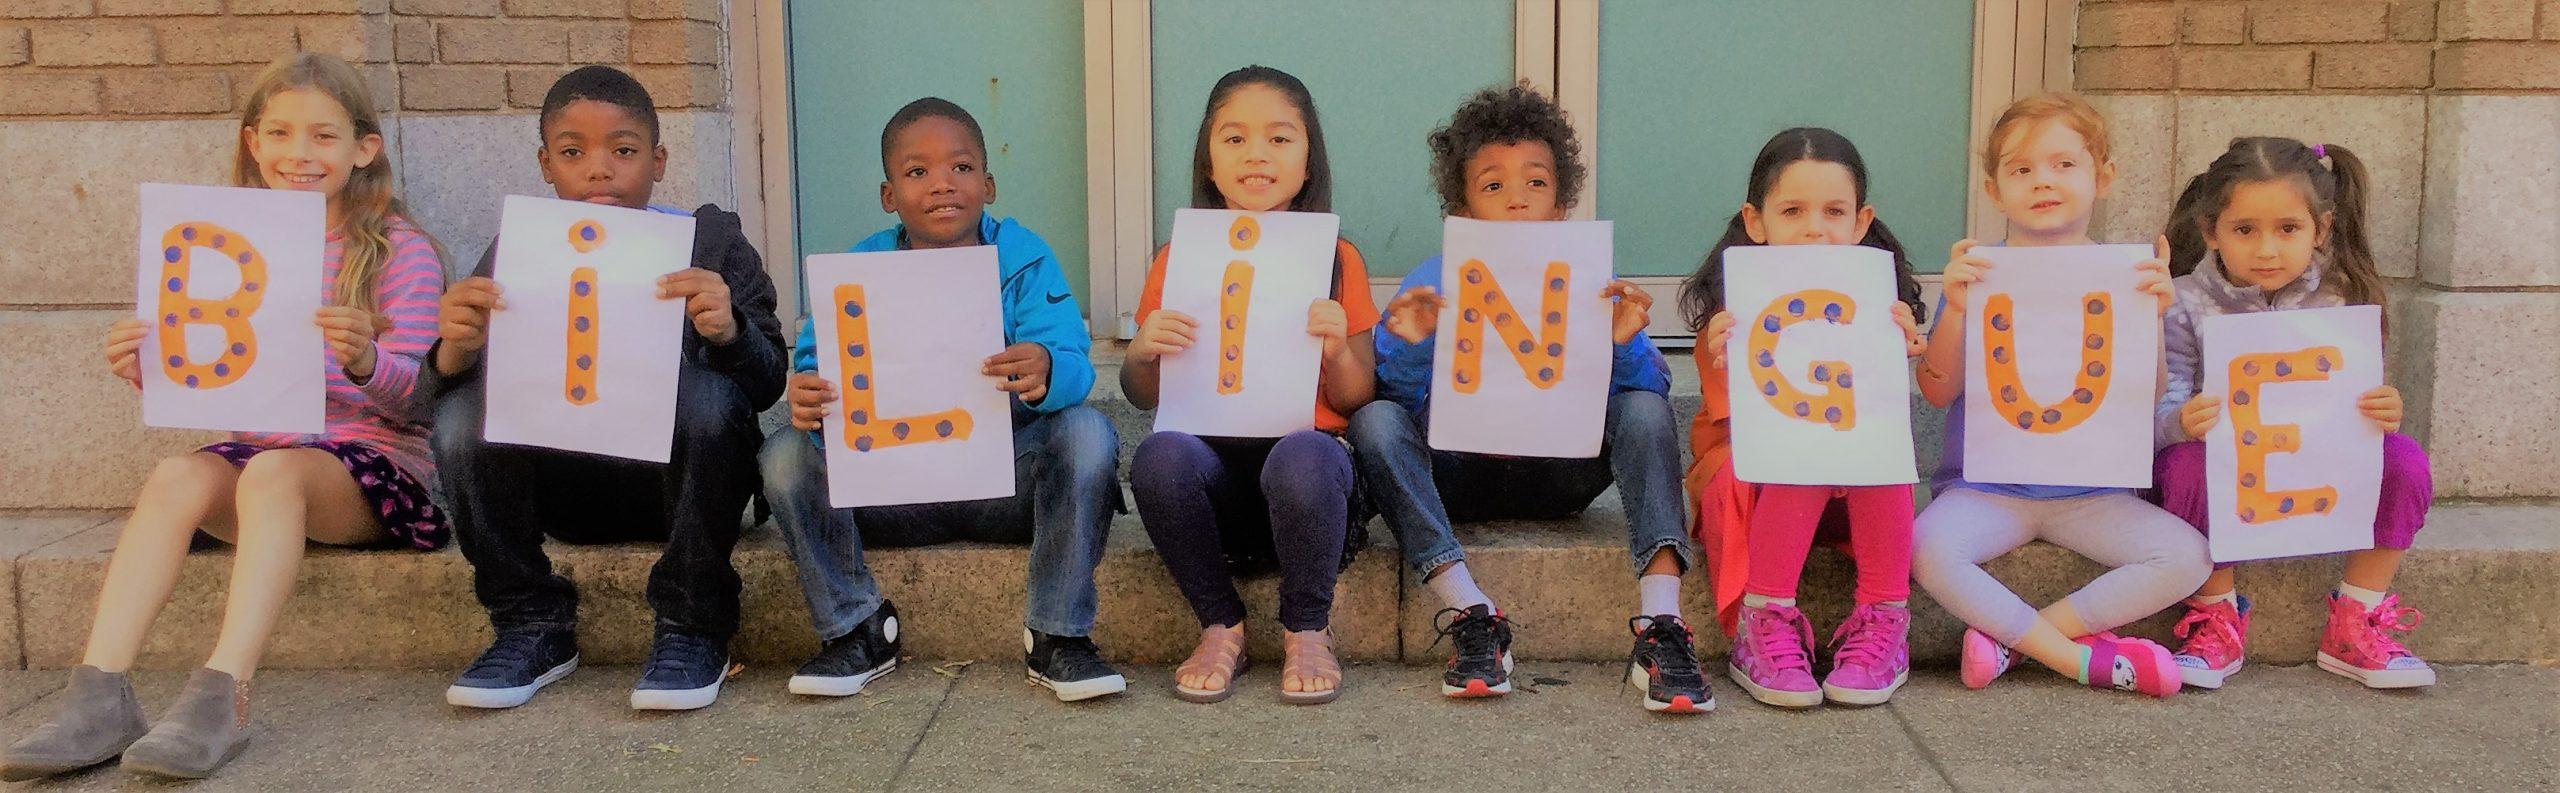 kids showing a bilingual panel